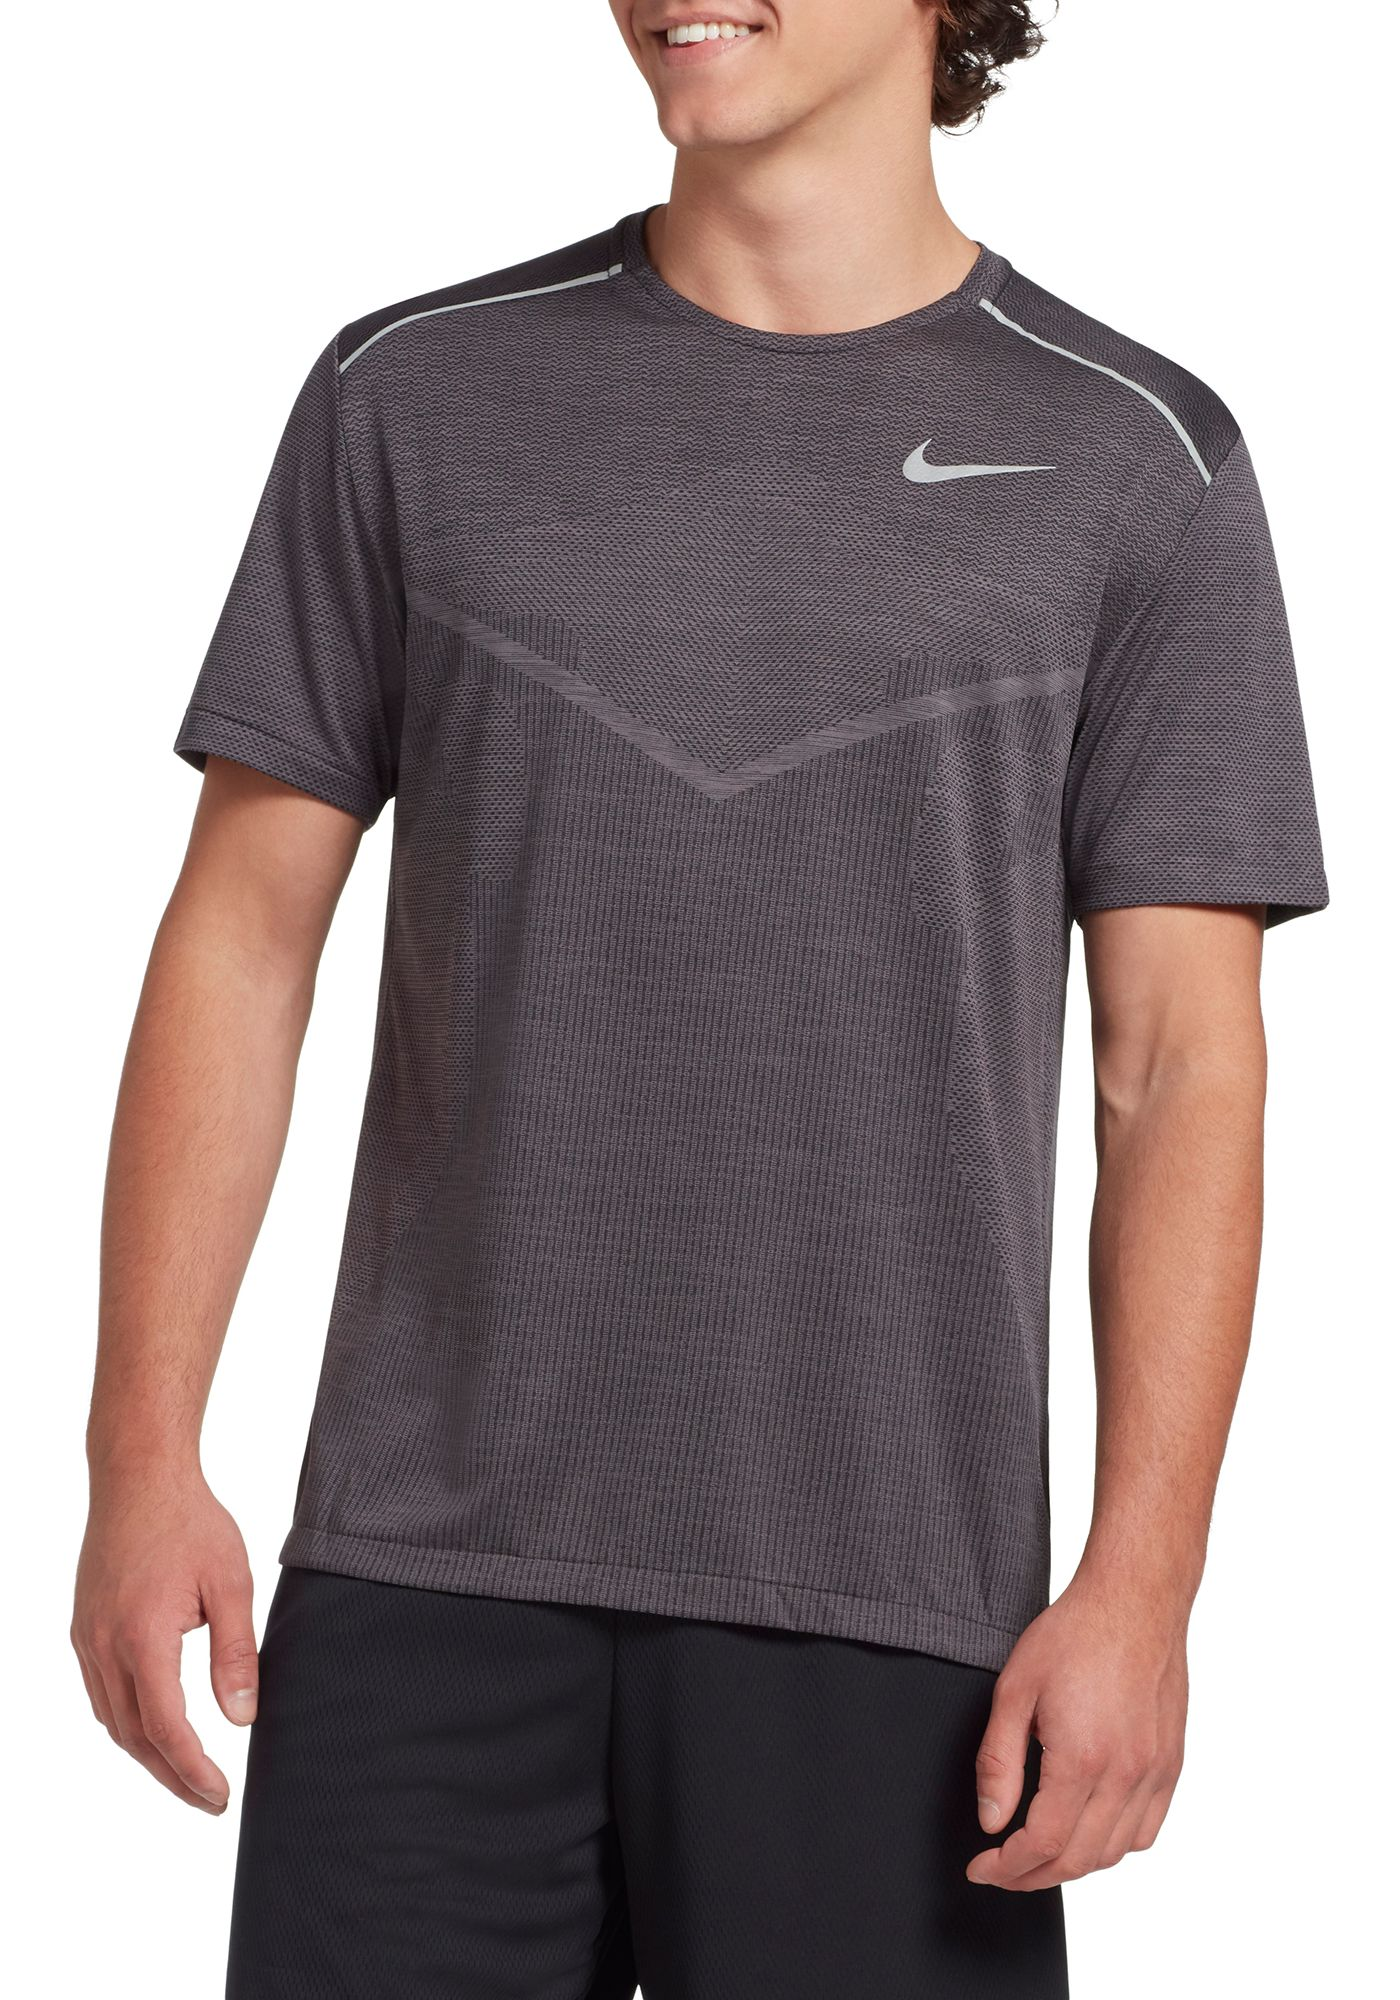 Nike Men's TechKnit Cool Ultra Running Tee